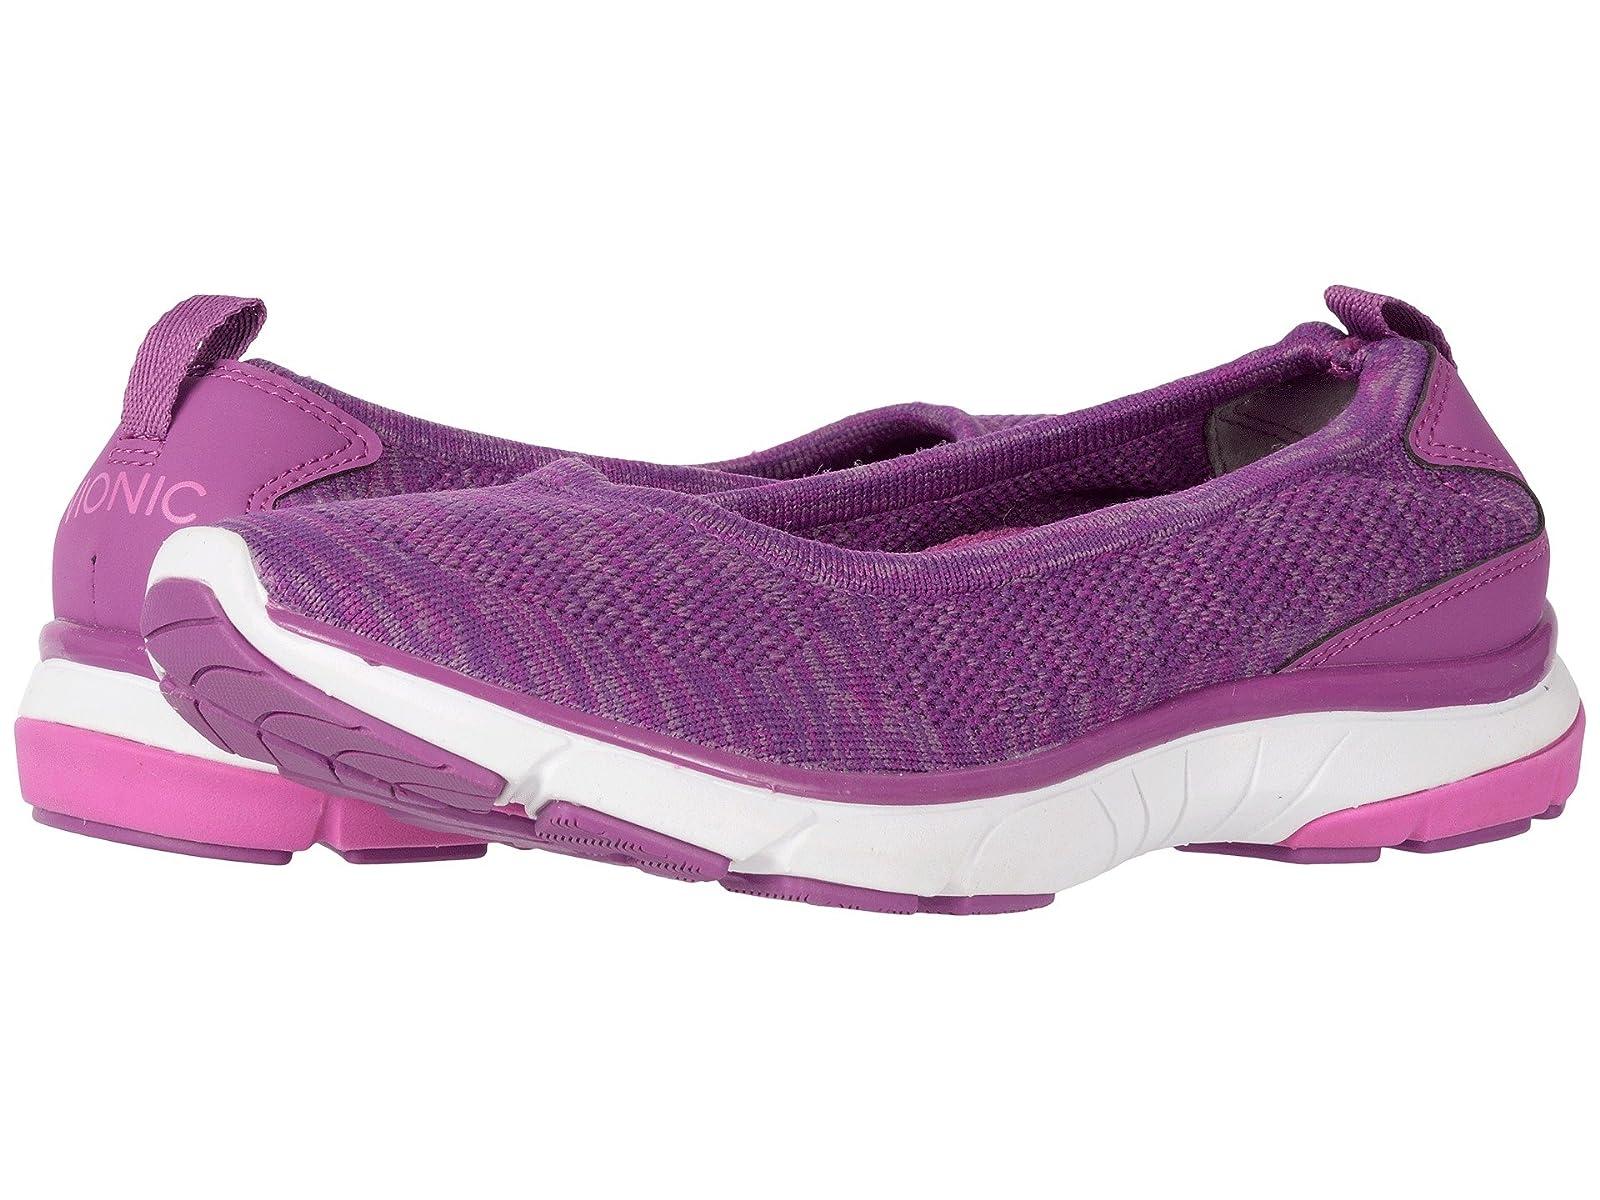 VIONIC AvivaCheap and distinctive eye-catching shoes